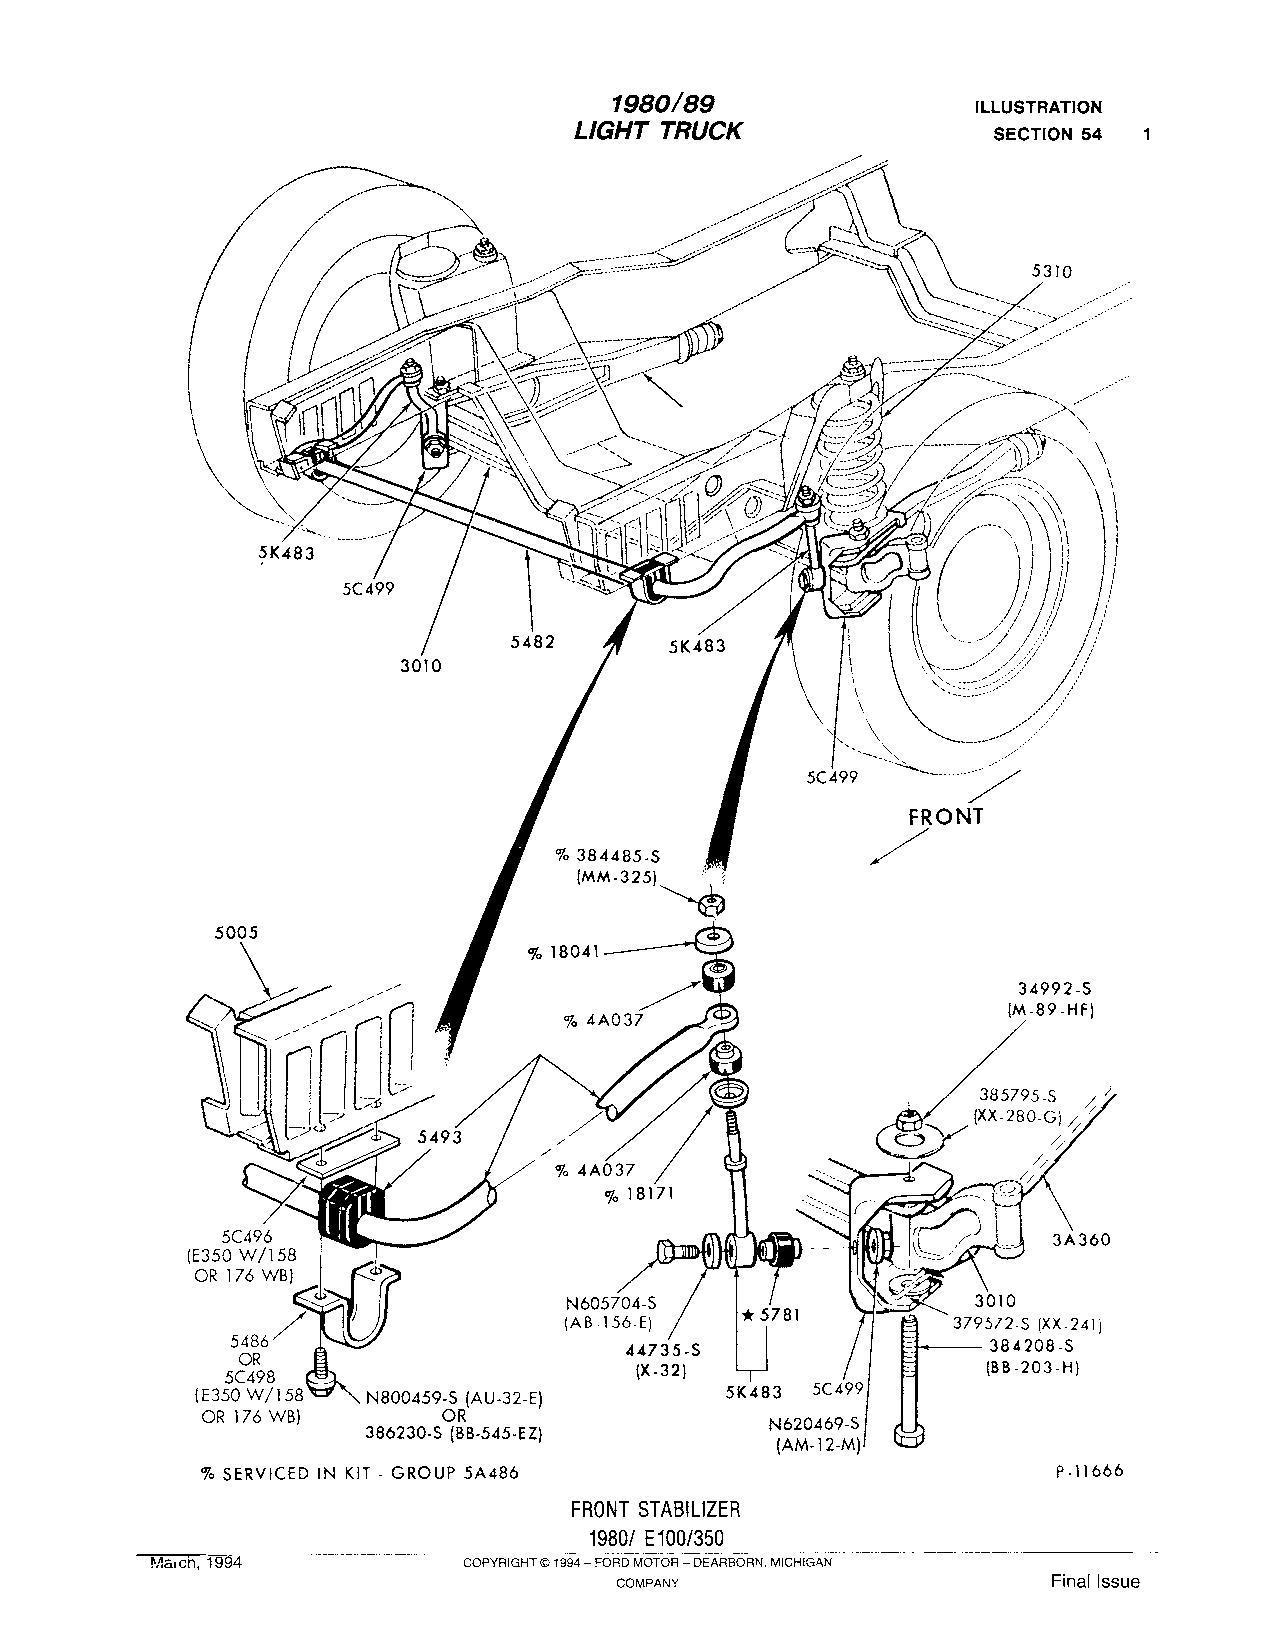 76 ford truck wiring diagram wiring diagram database Ford Truck Wiring Harness dual fuel tank wiring diagram for ford truck wiring diagram database 76 f150 wiring diagram 1976